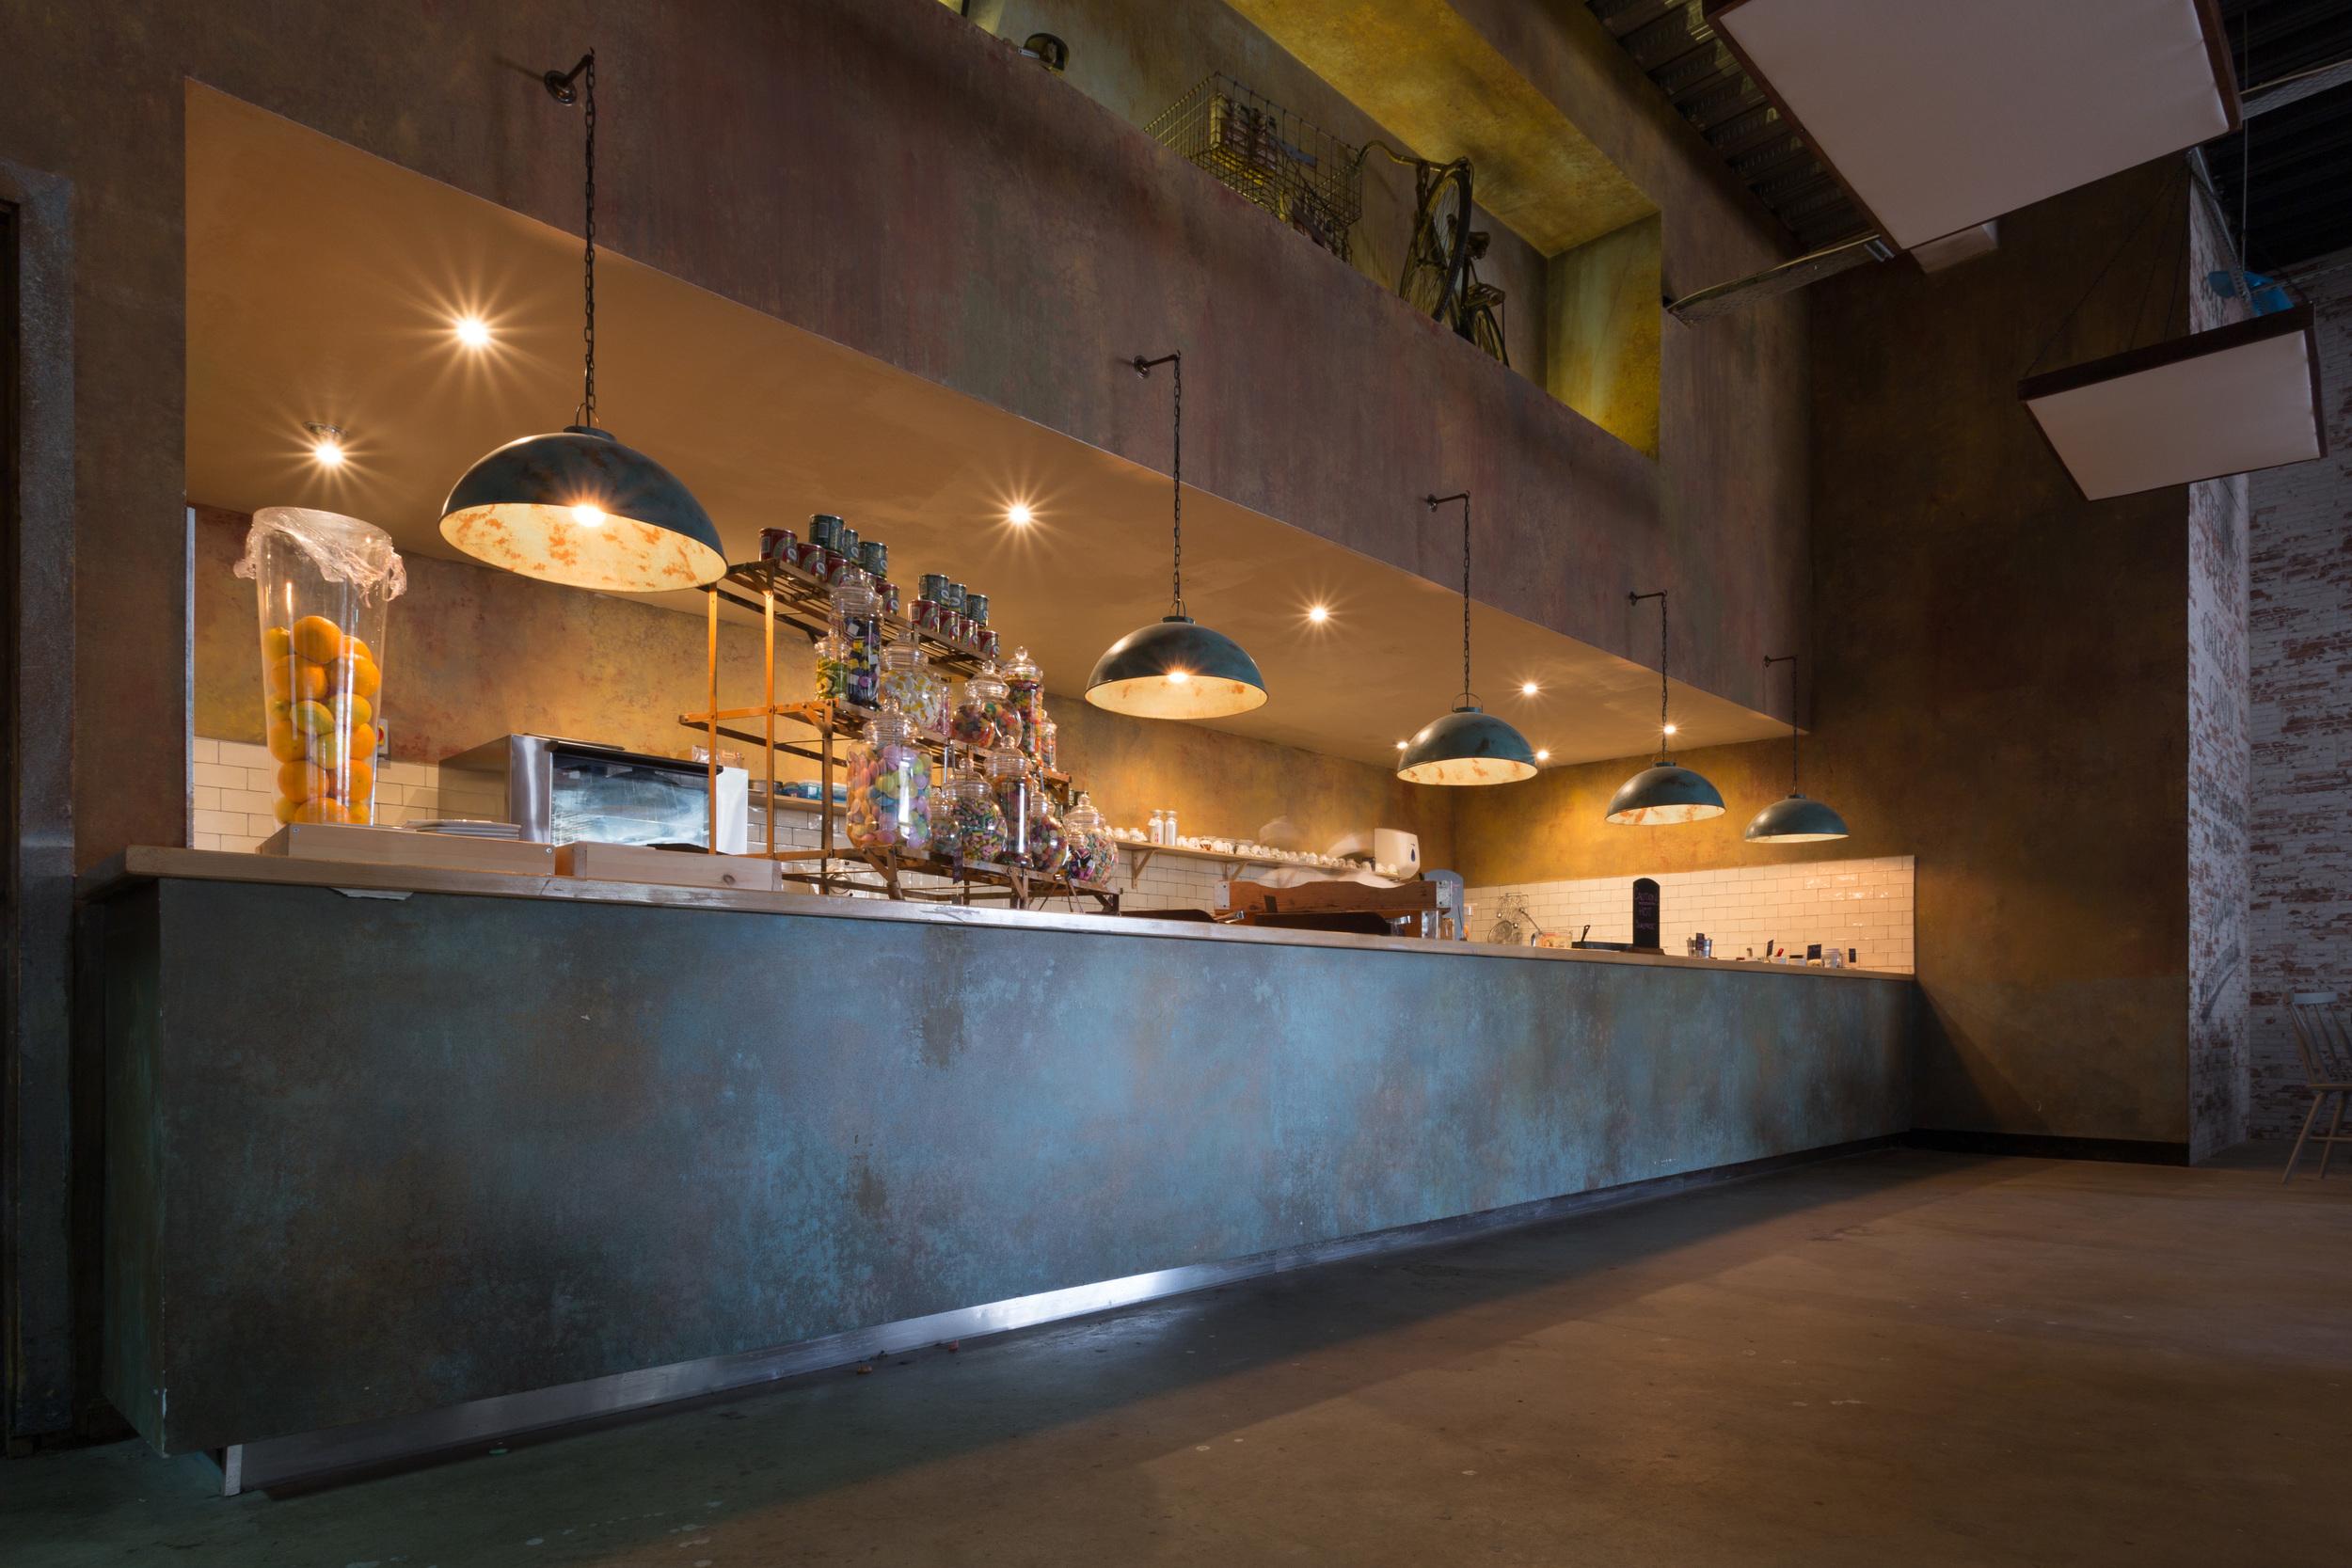 Interior of the Salt and Good Restaurant, Stevenage.